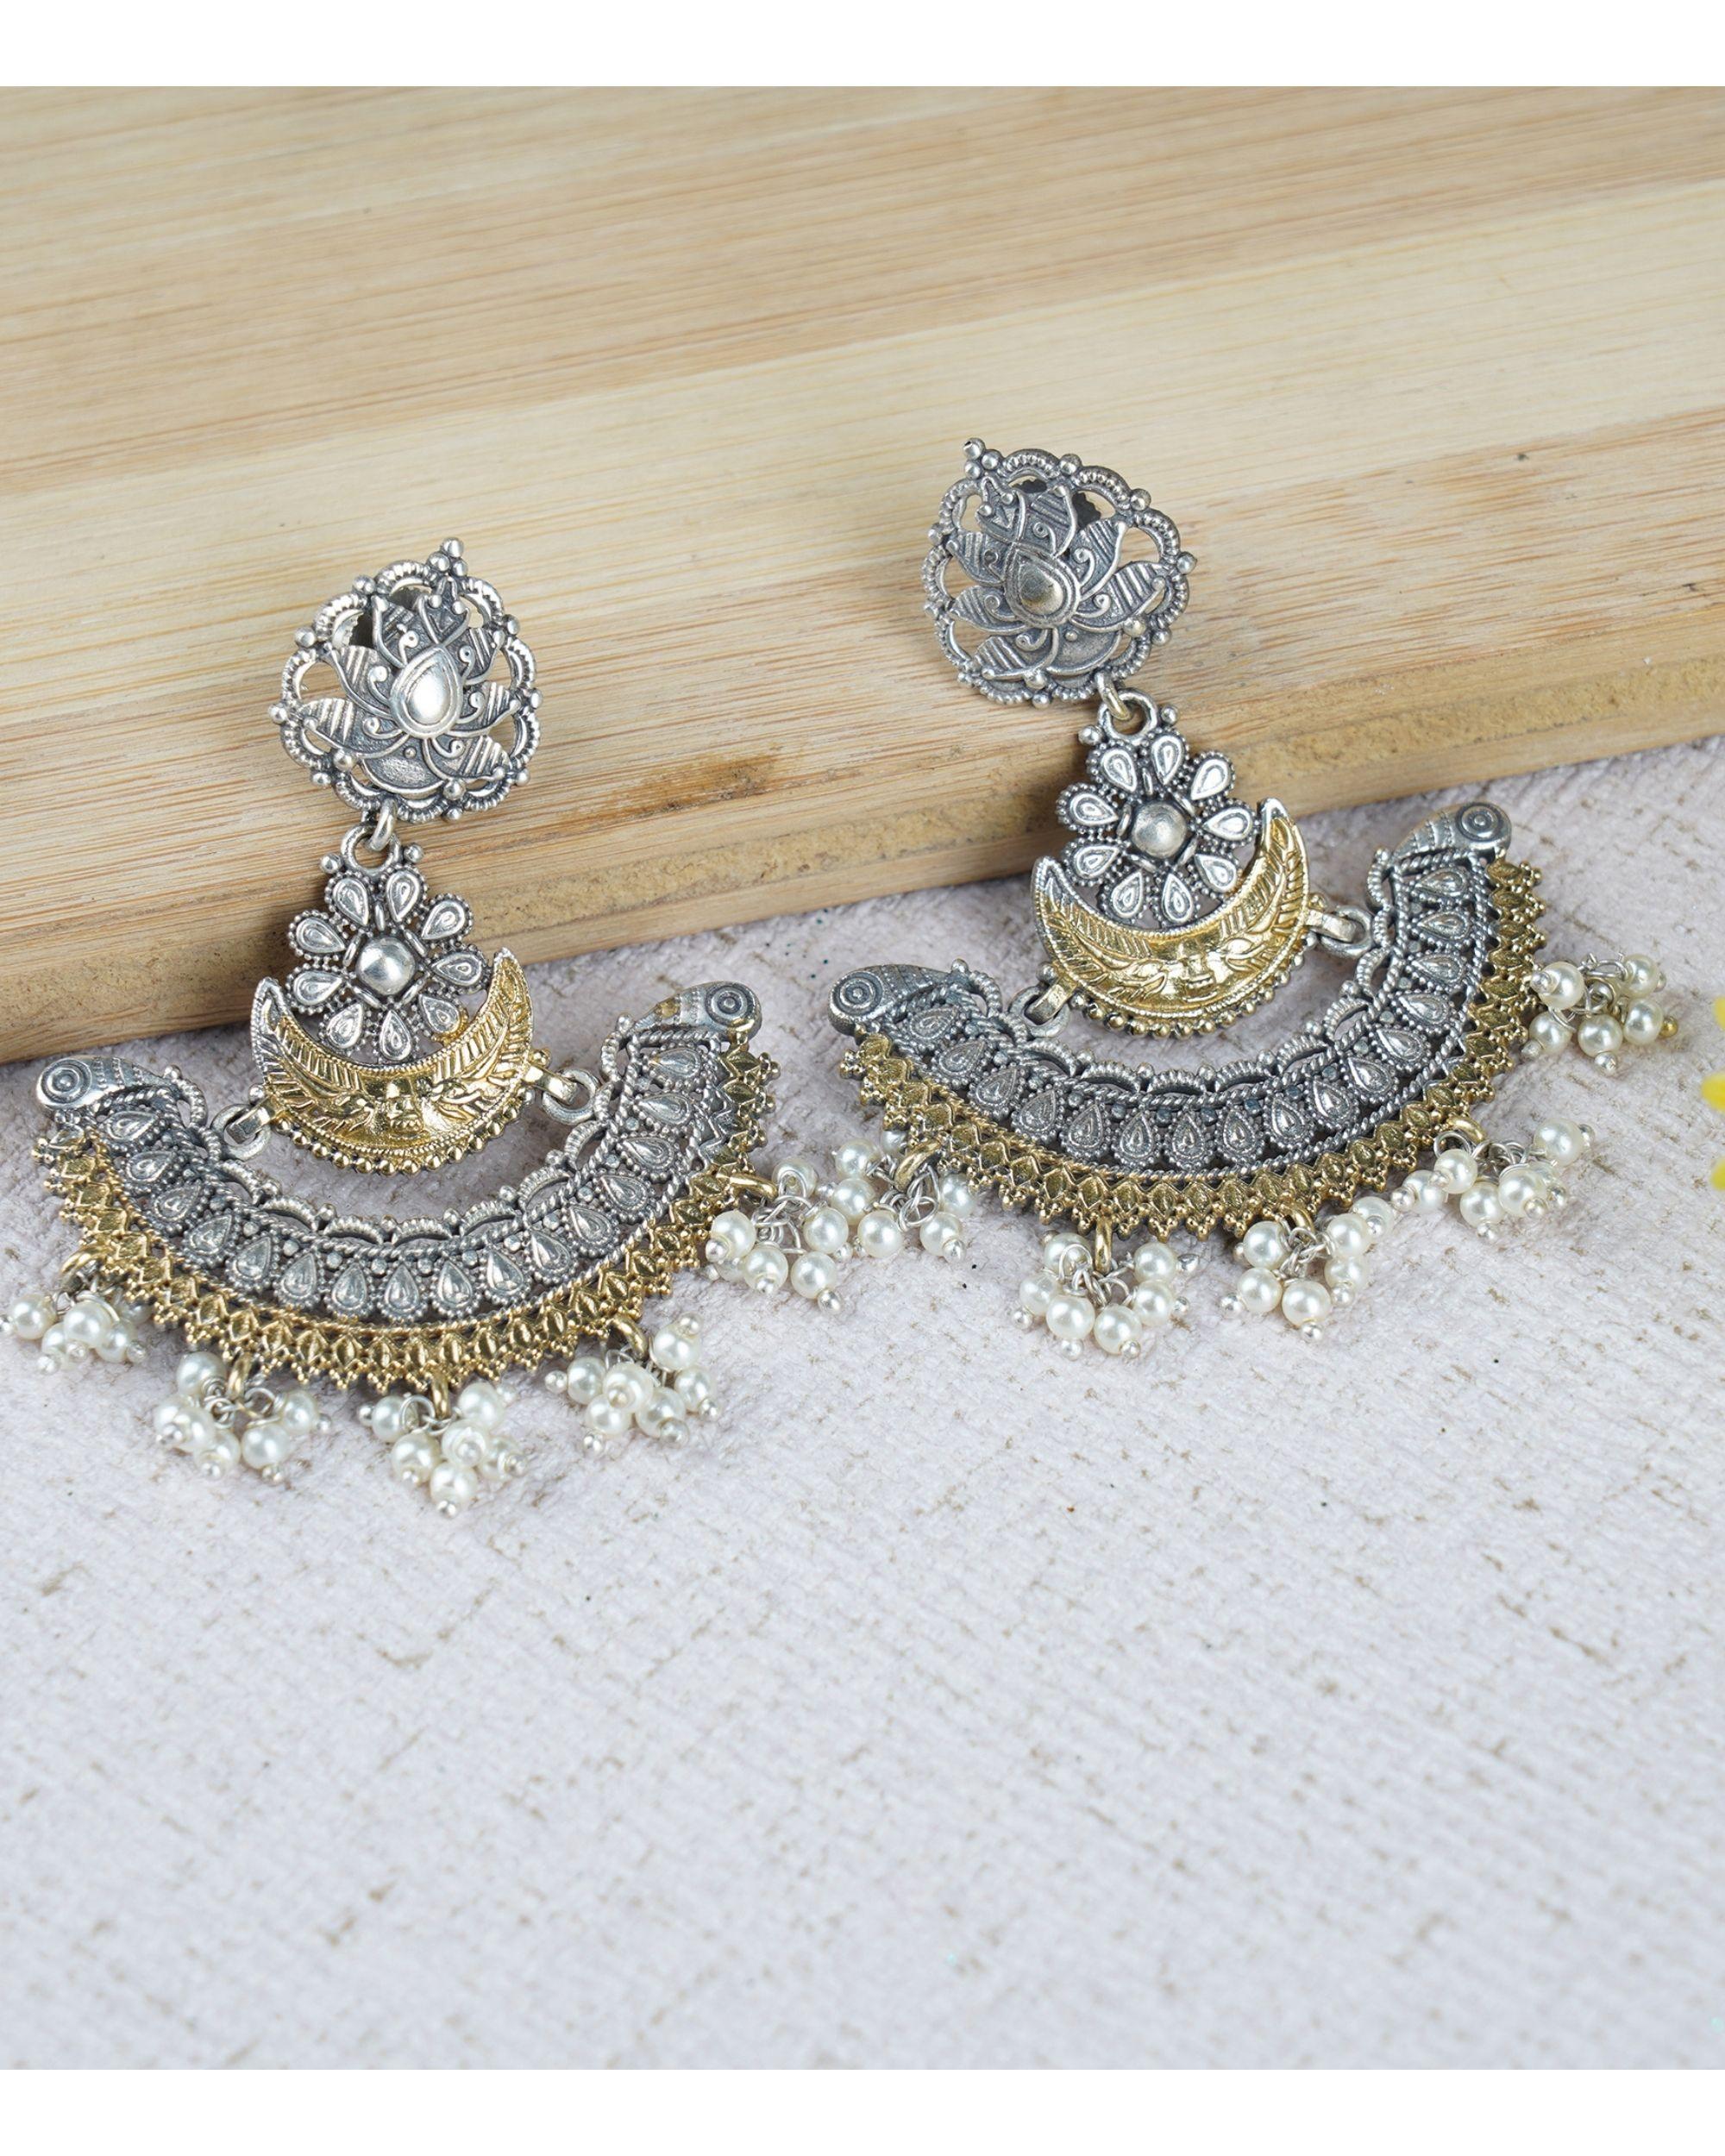 Dual toned moon earrings